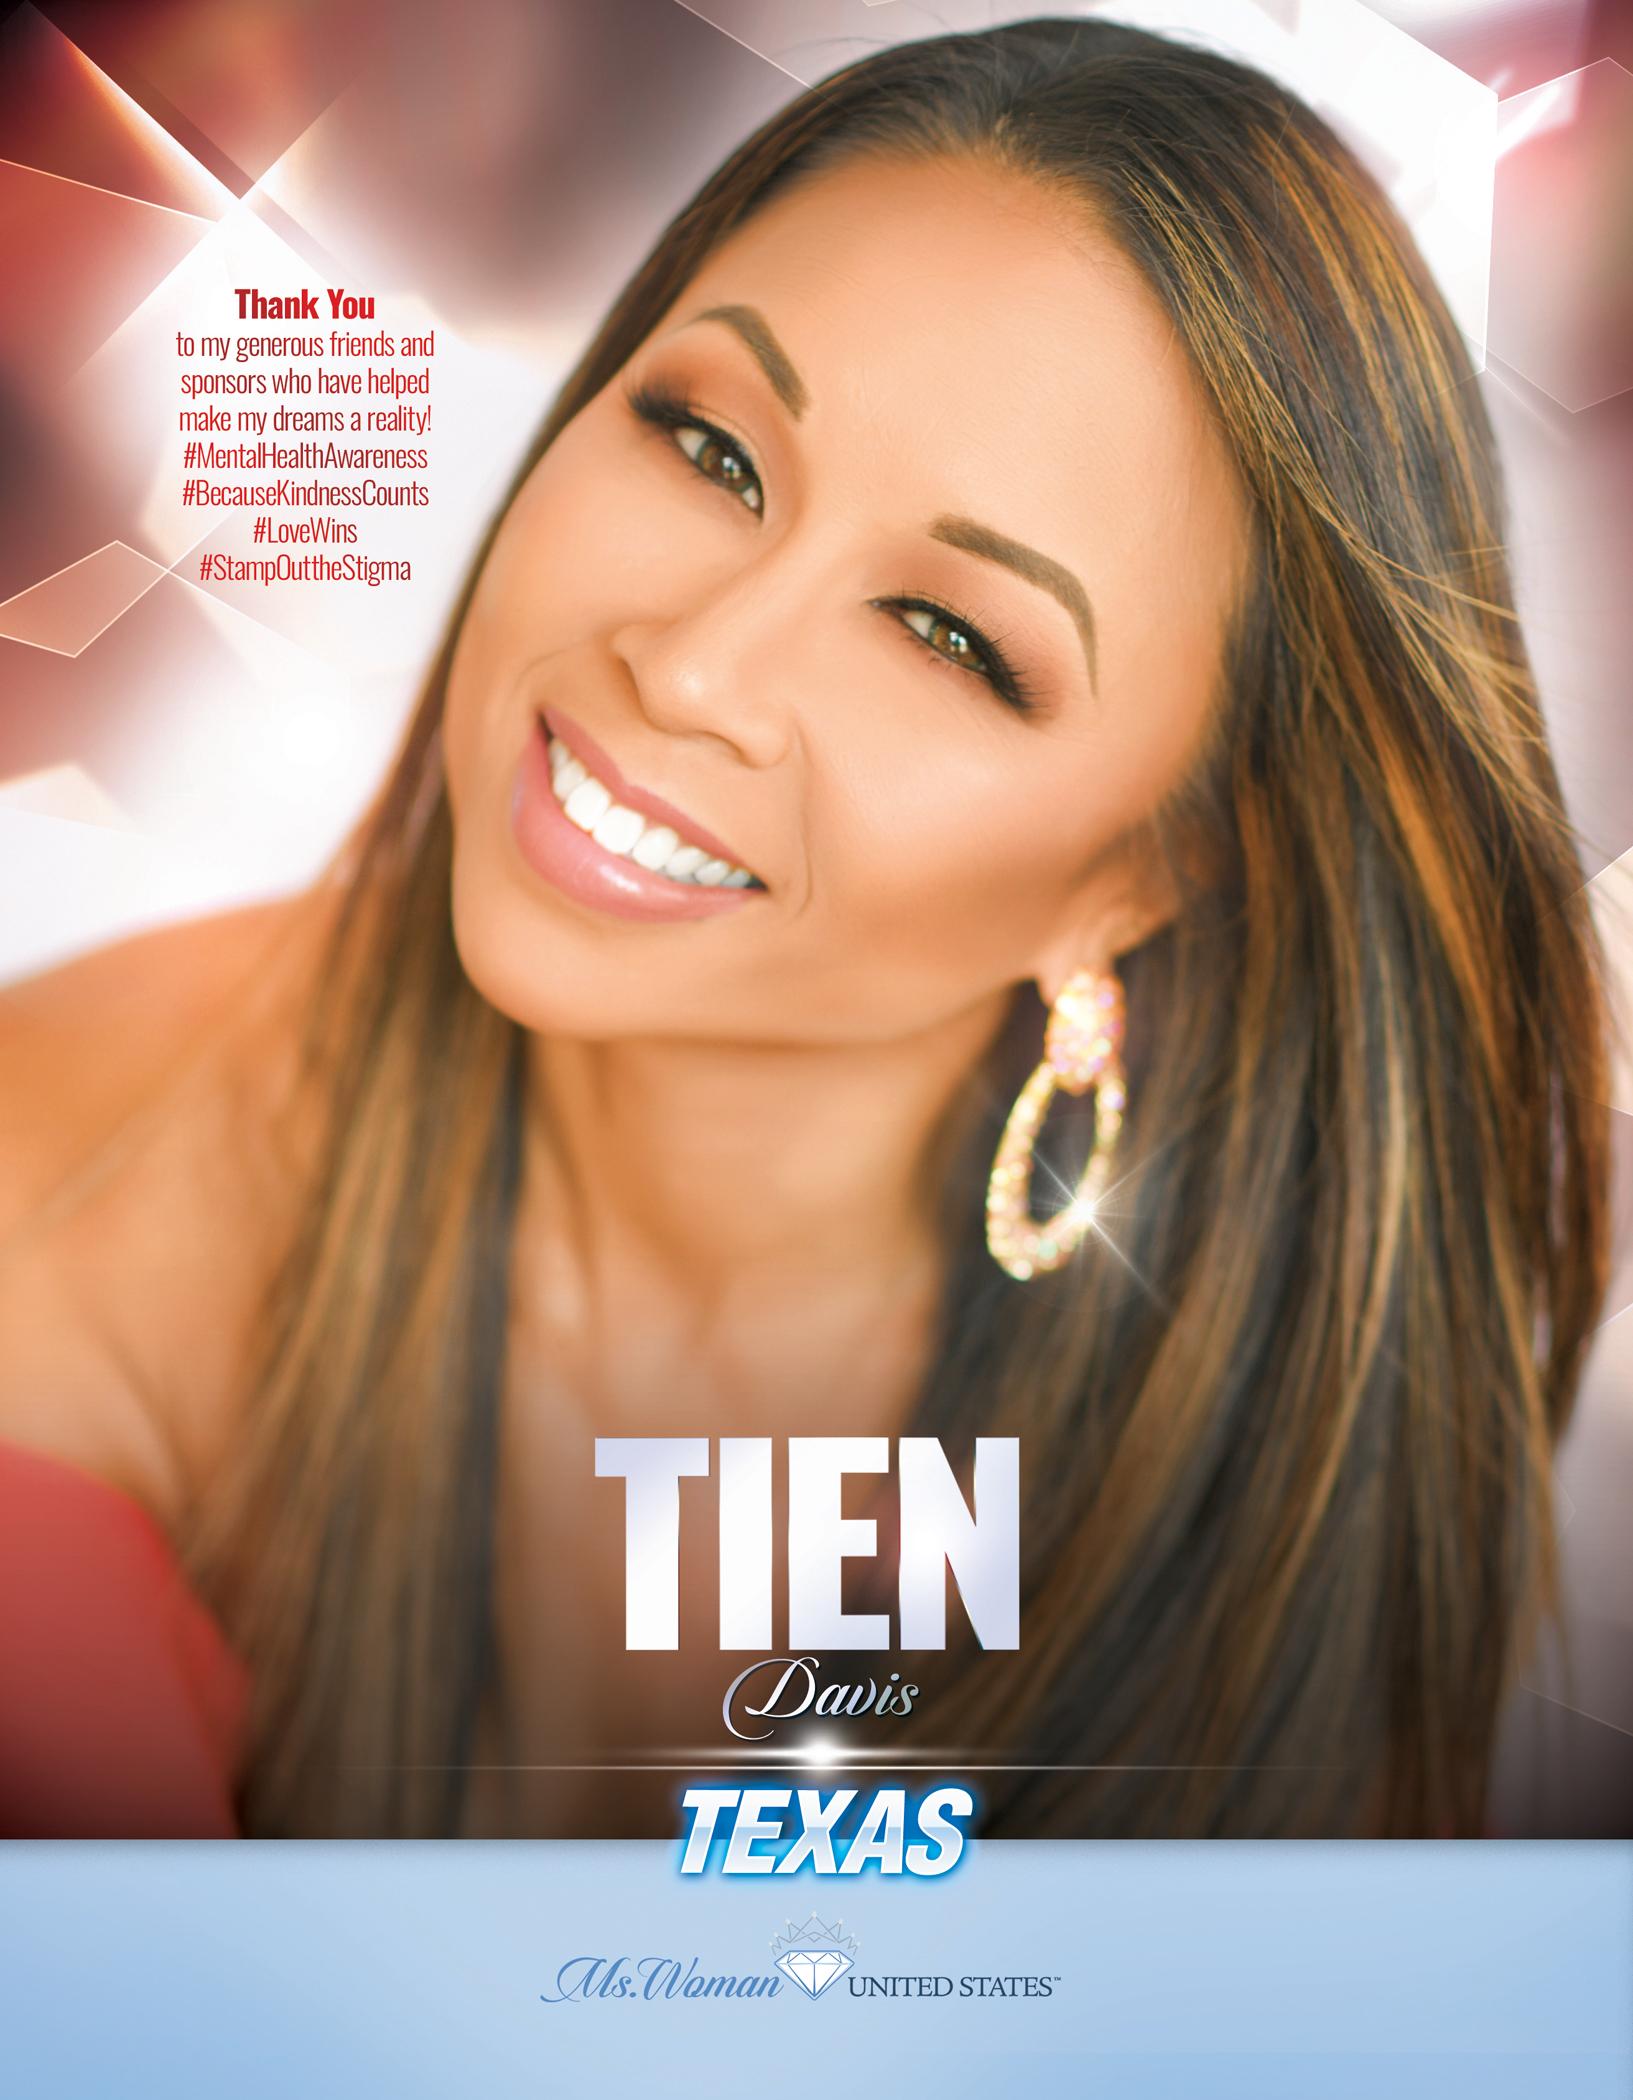 Tien Davis Ms. Woman Texas United States - 2019